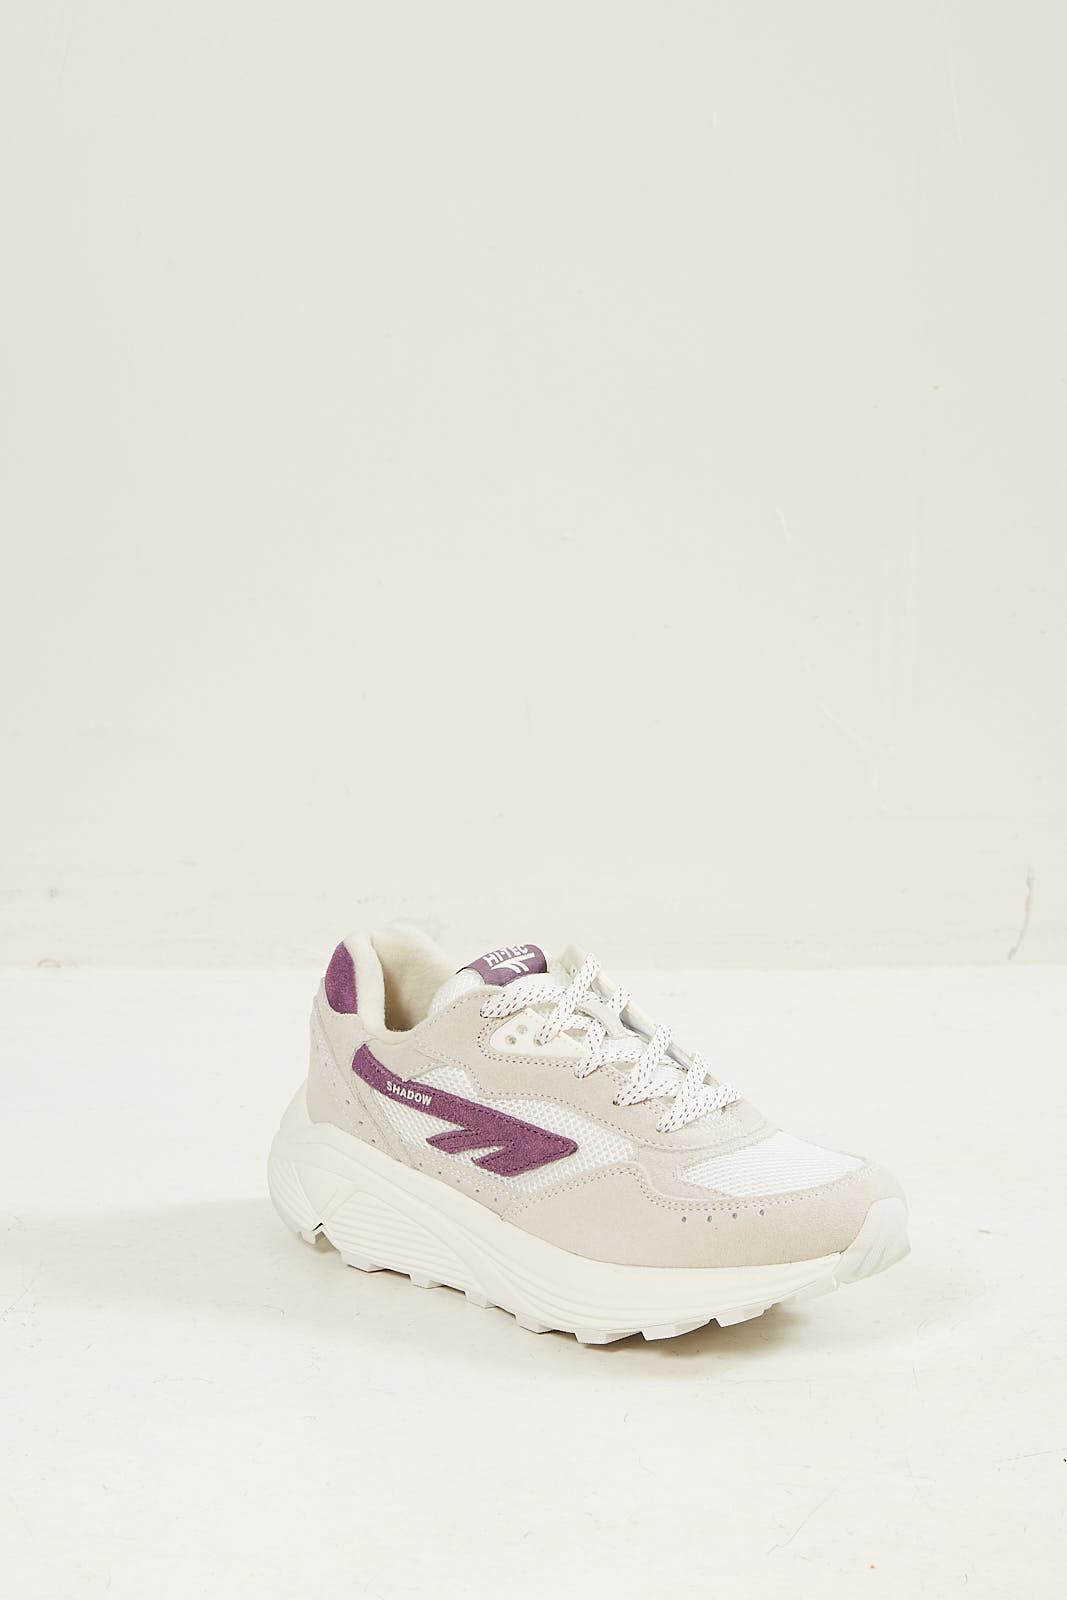 Hi-Tec Hts silver shadow sneakers 016 cotton purple dusk